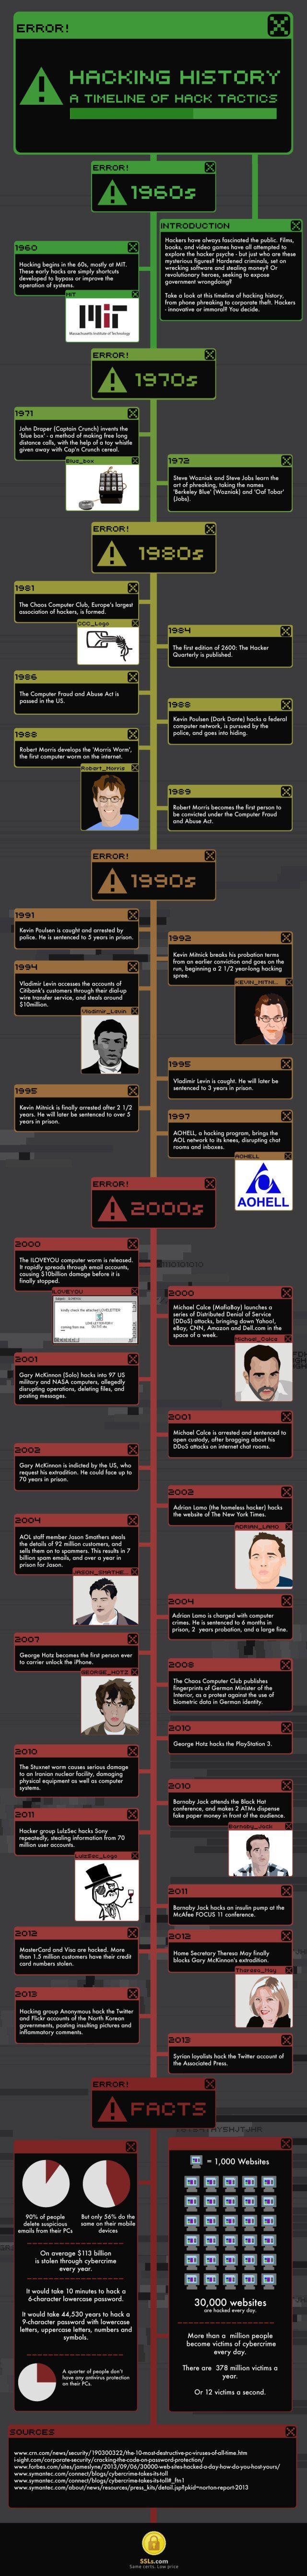 Hacking history #infografia #infographic